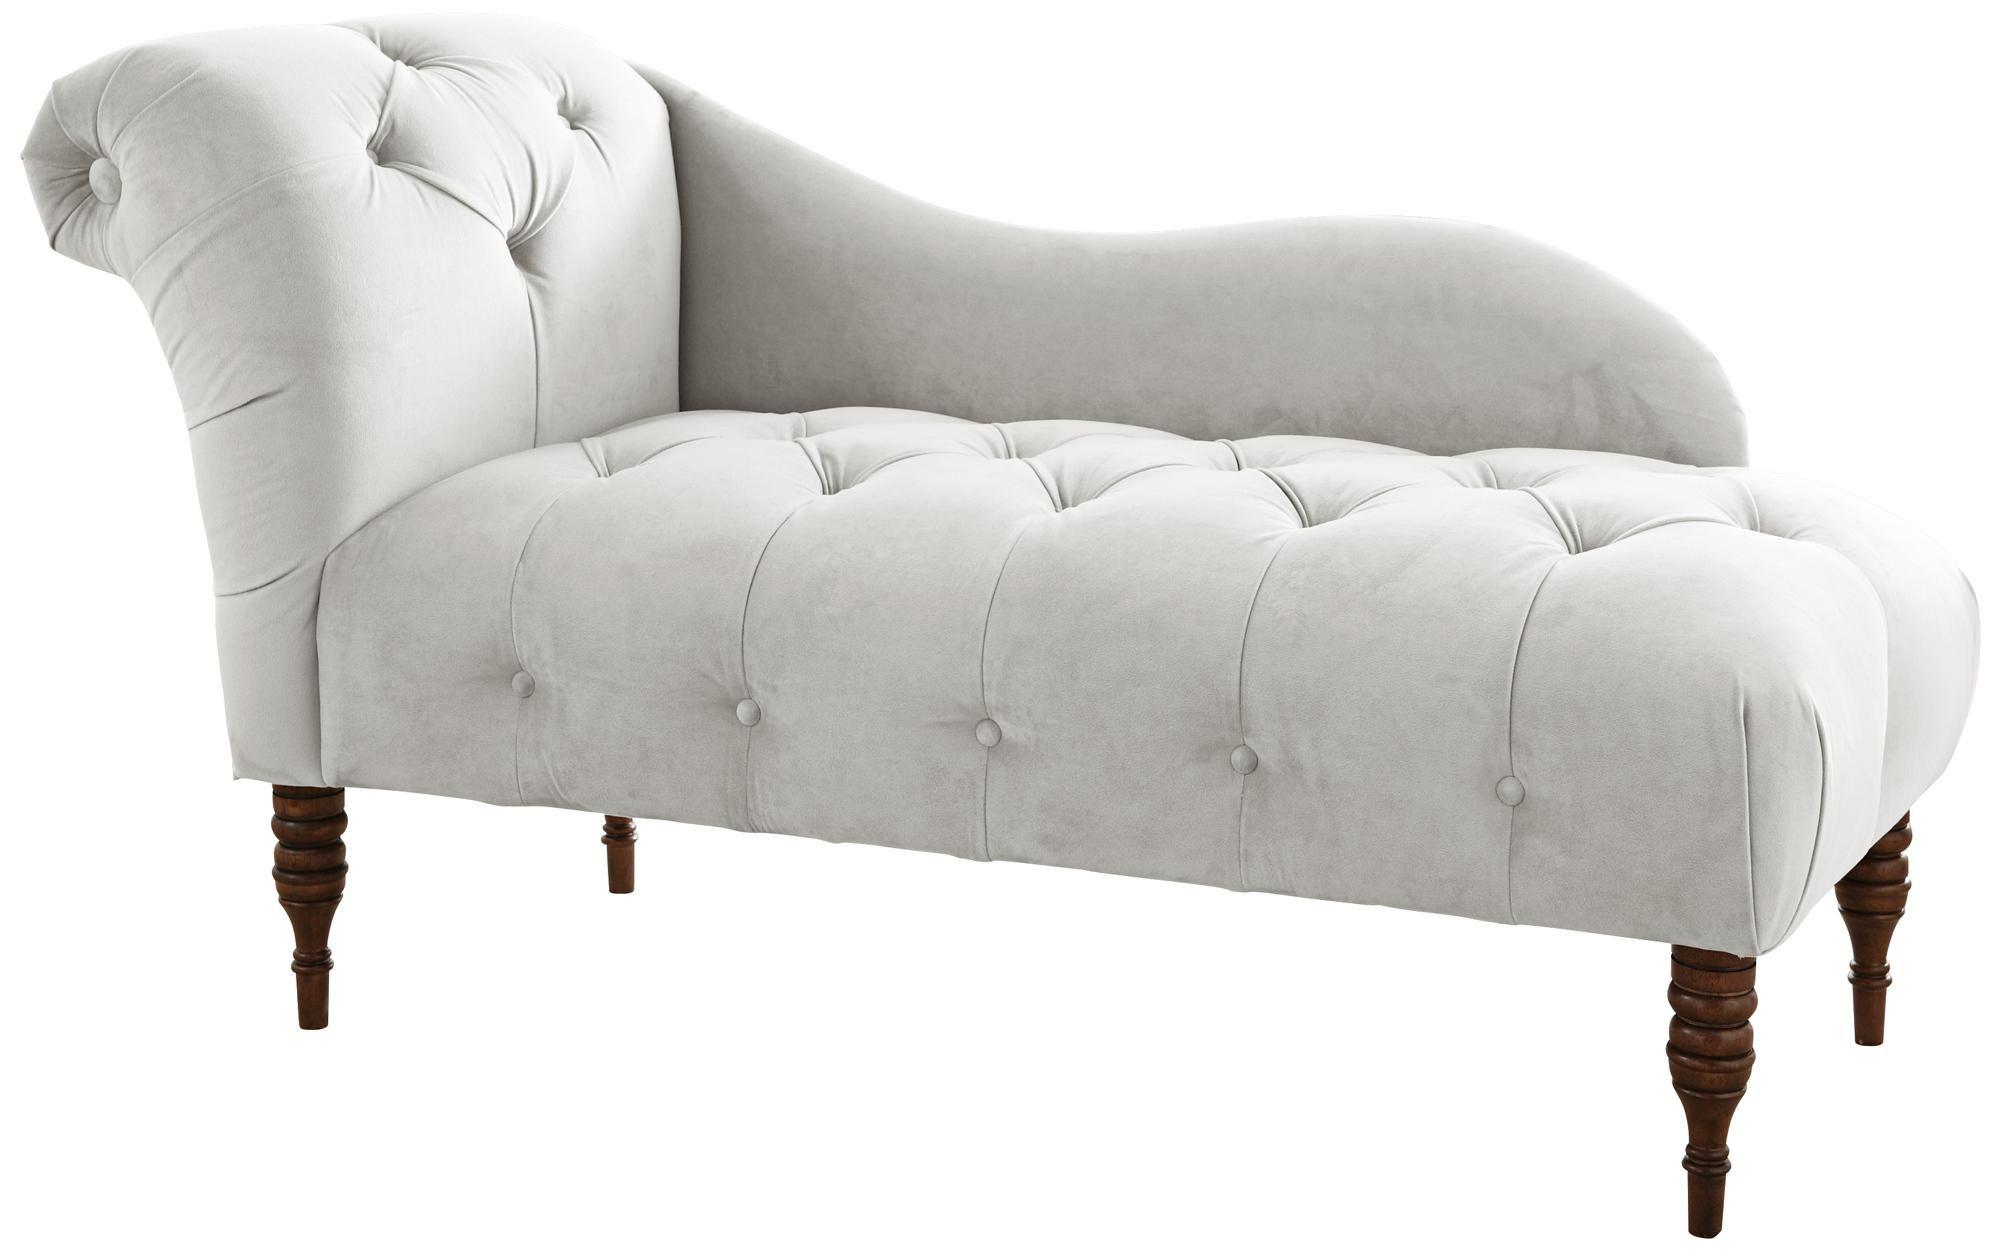 White Velvet Upholstered Chaise Lounge Chair Style